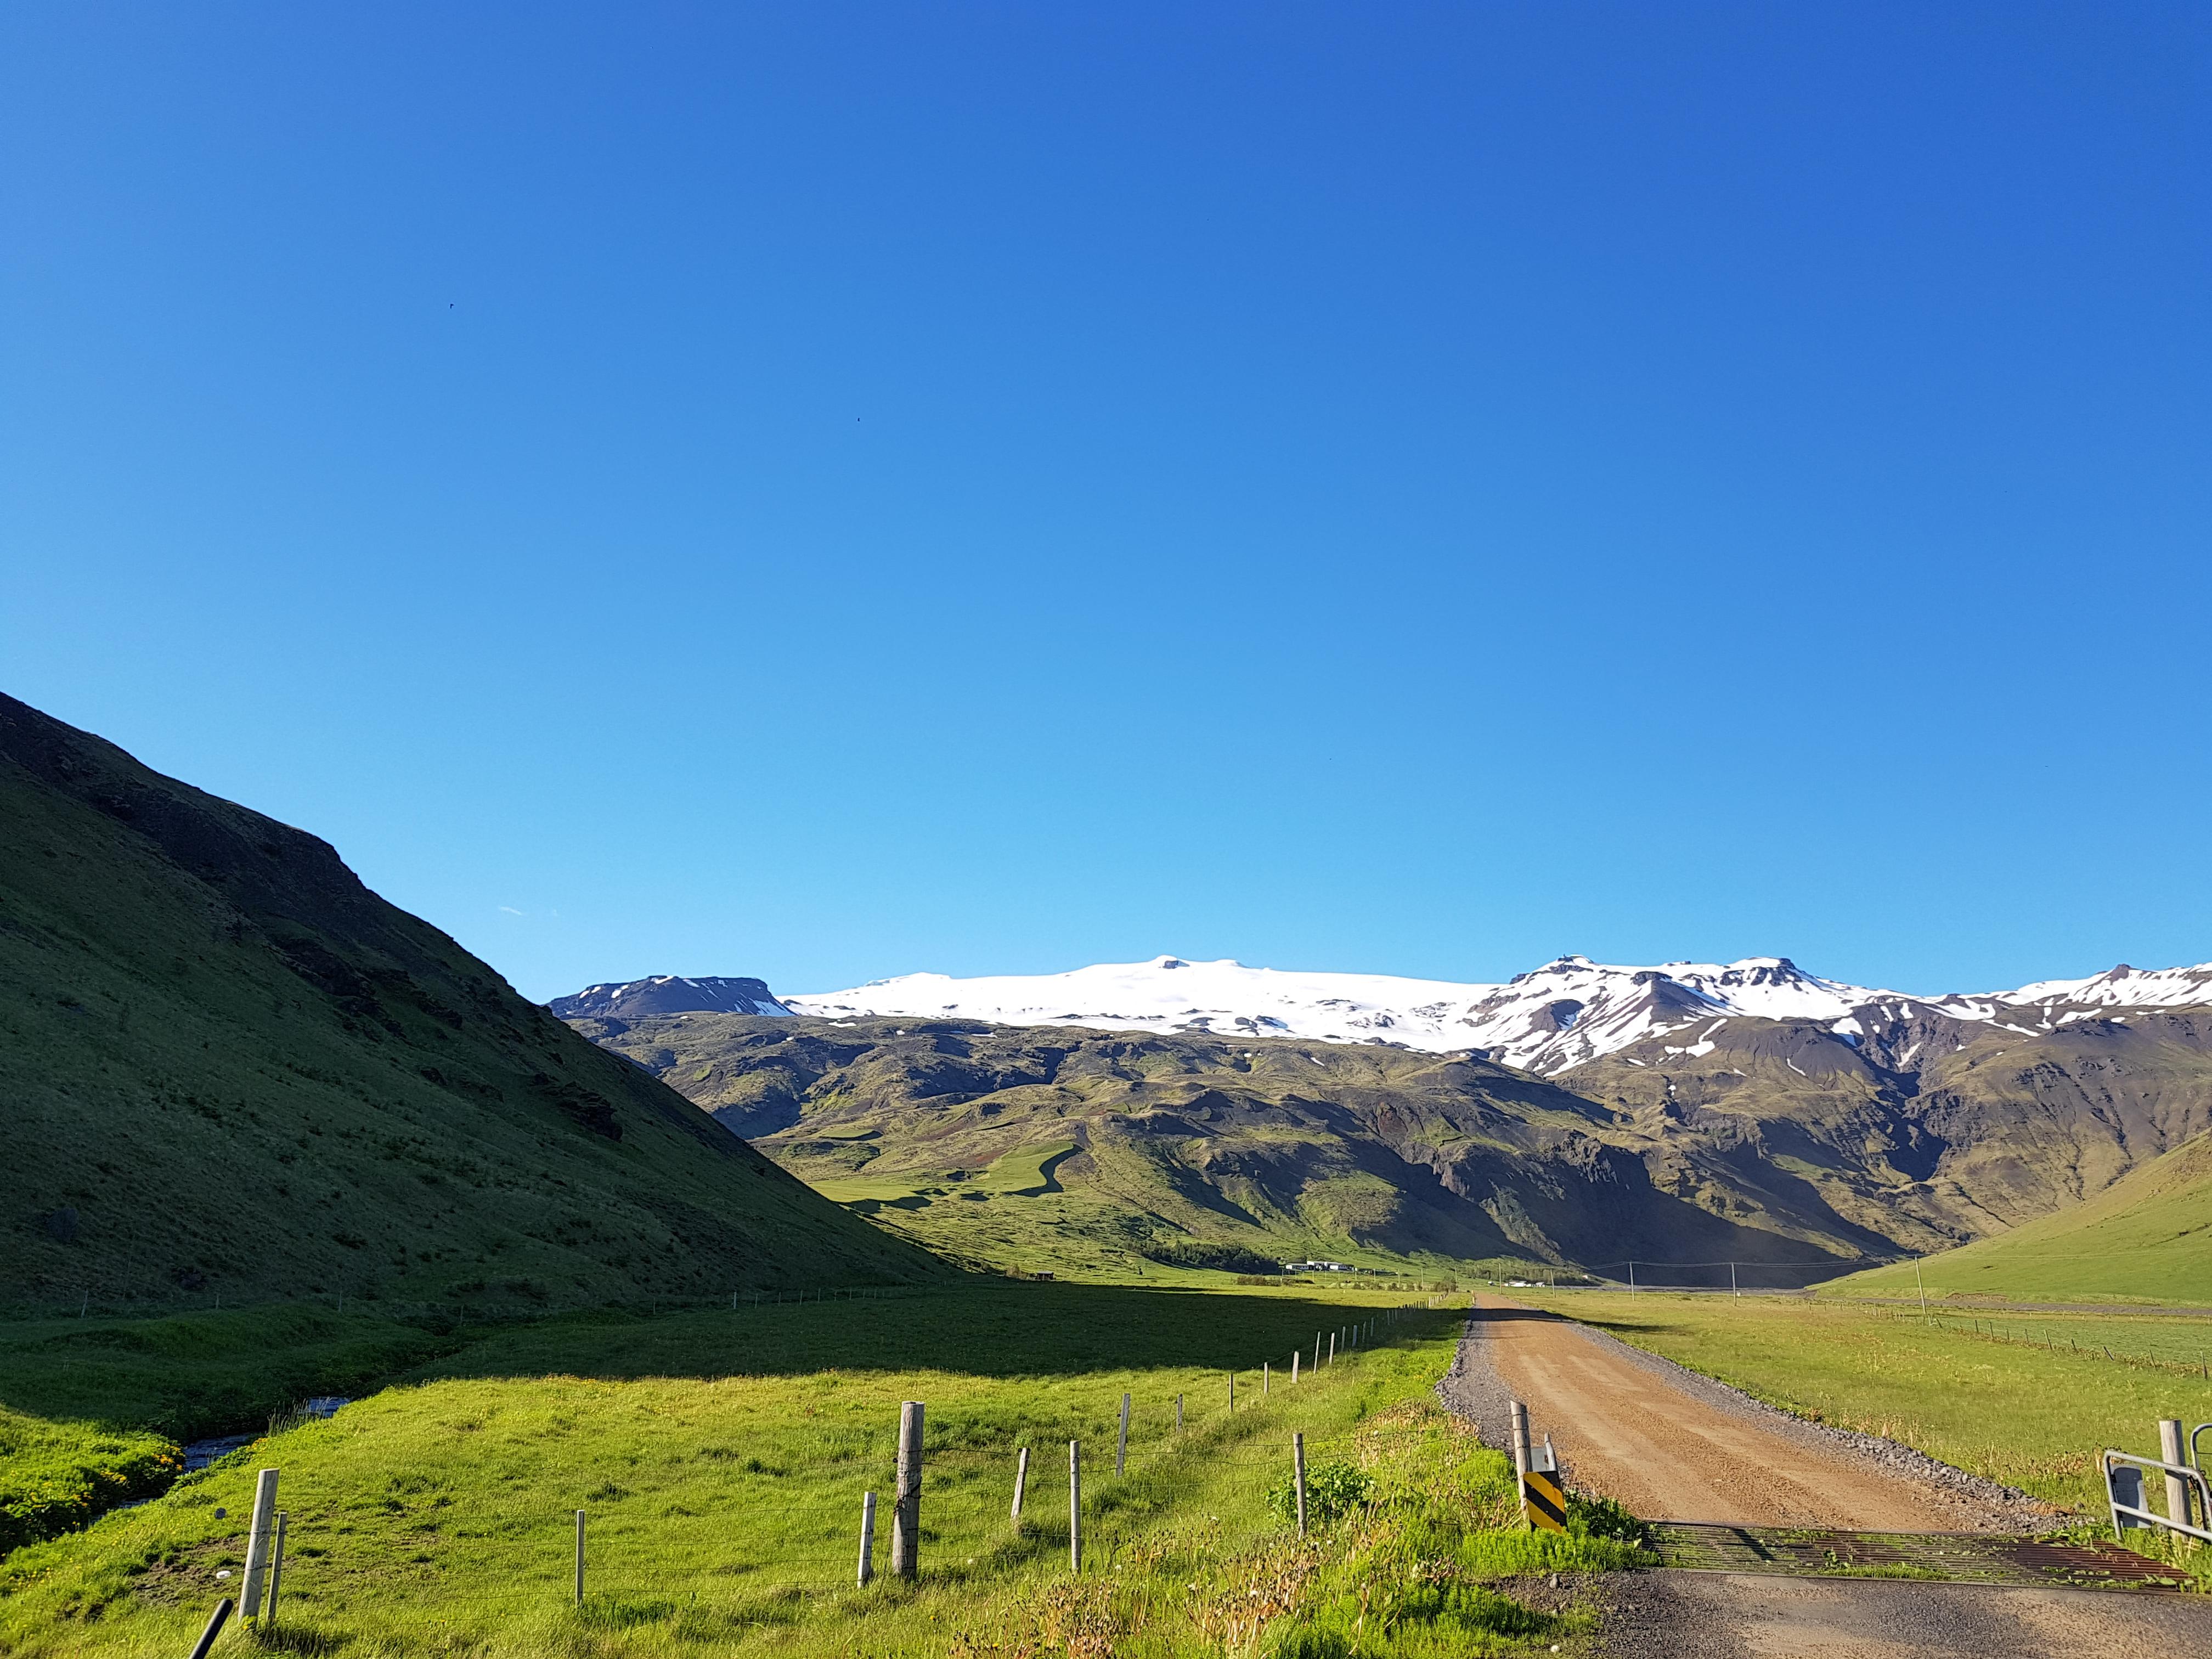 Eyjafjallajökull glacier par une journée ensoleillée.